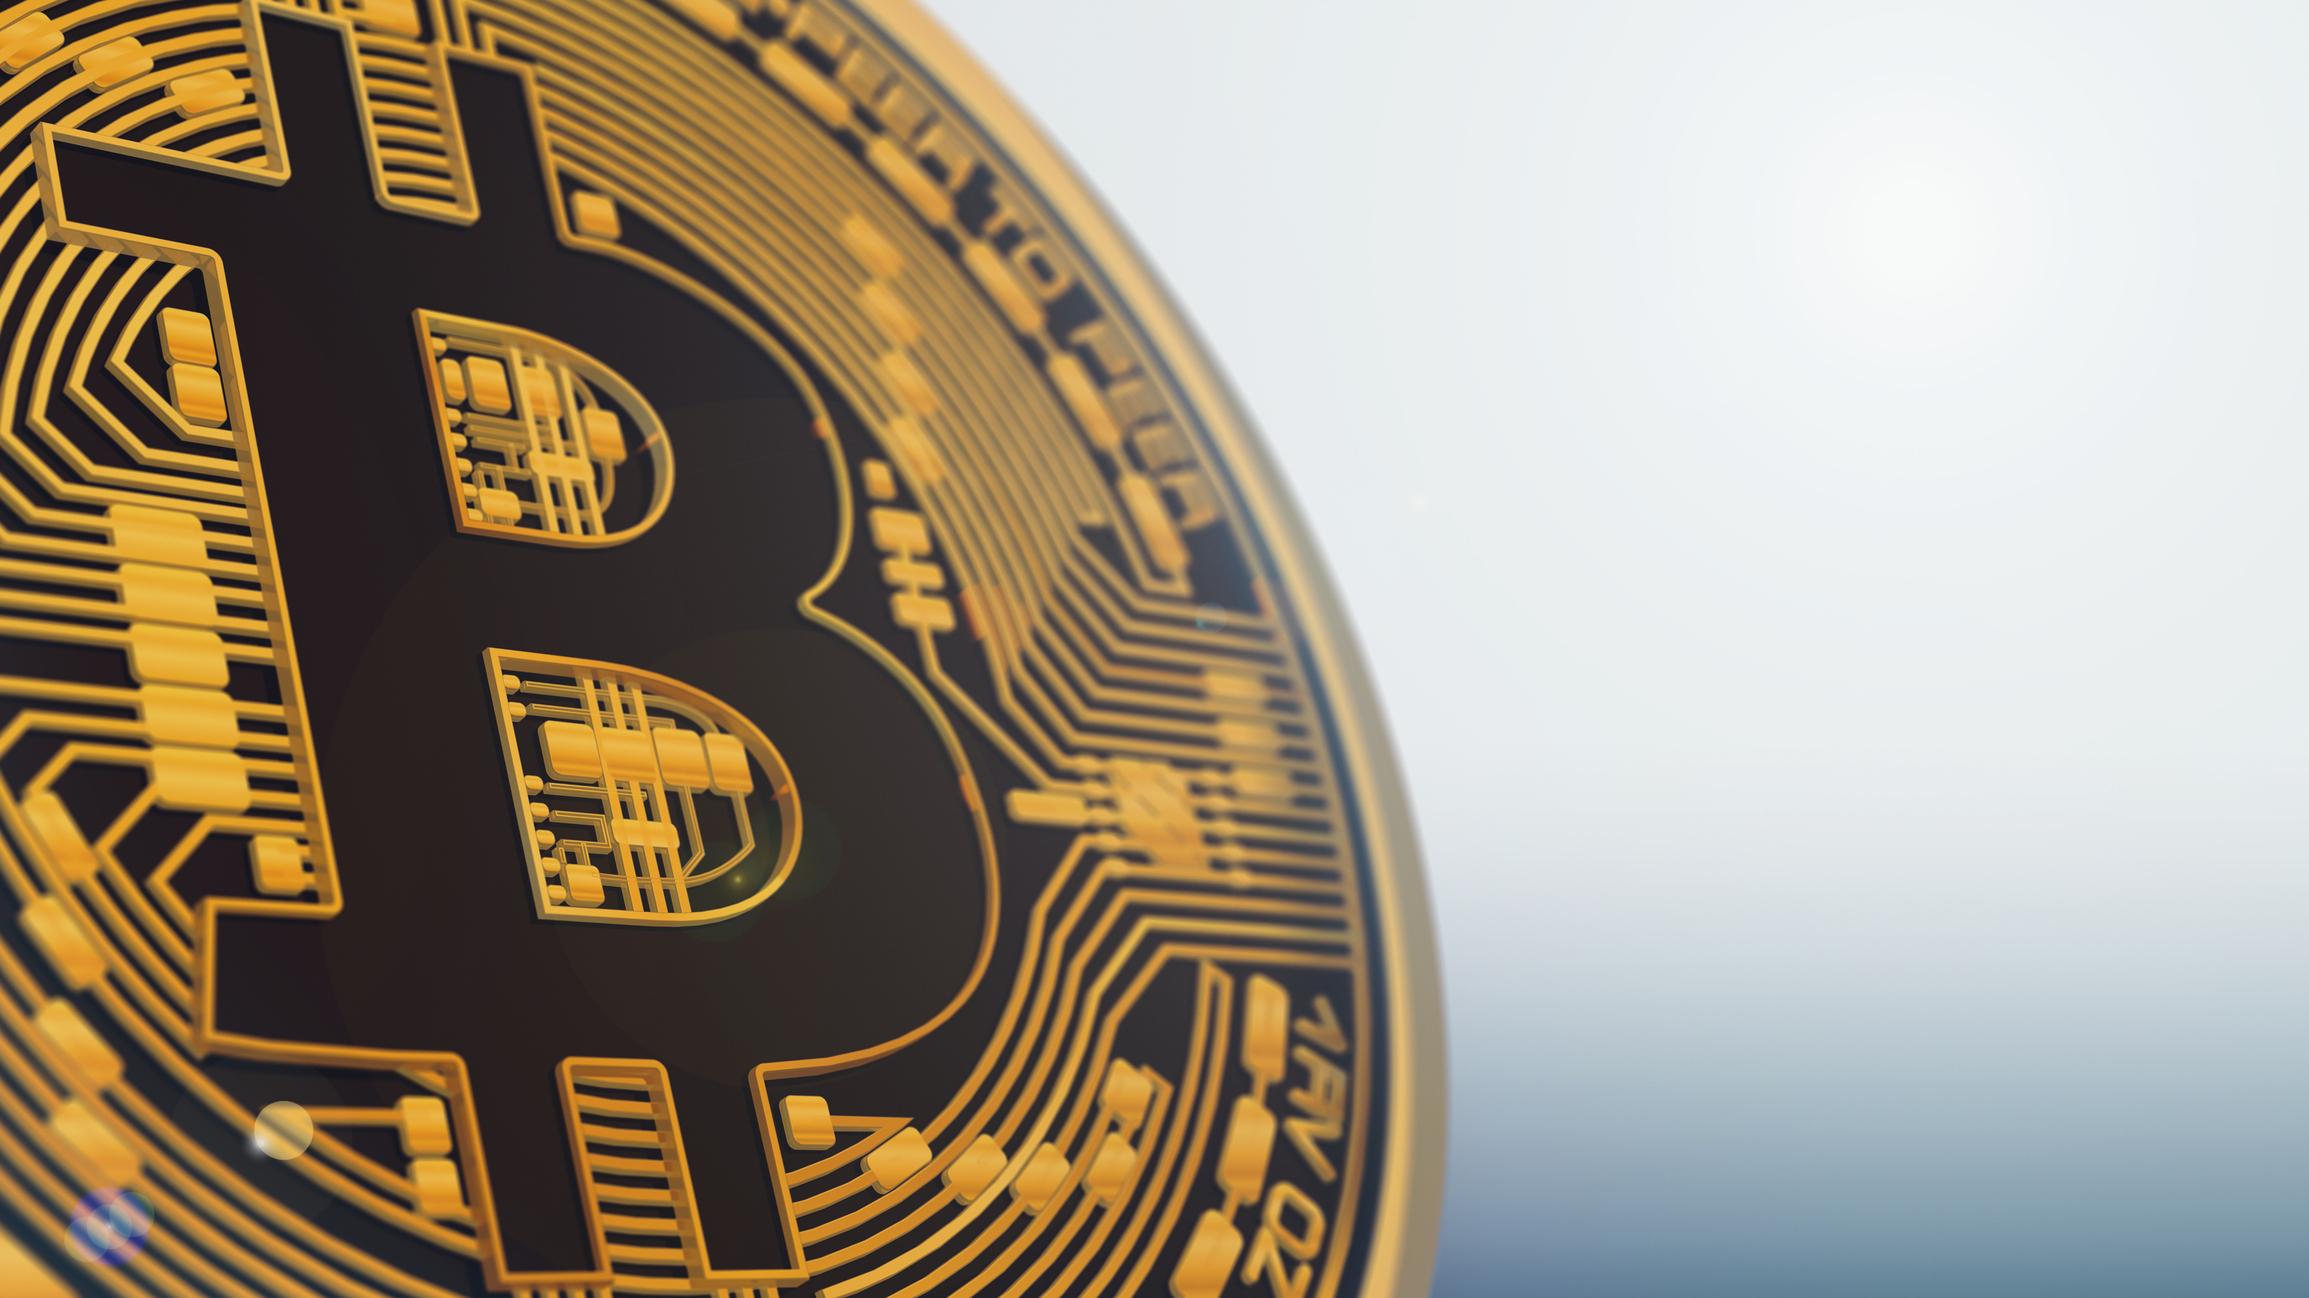 A physical gold bitcoin